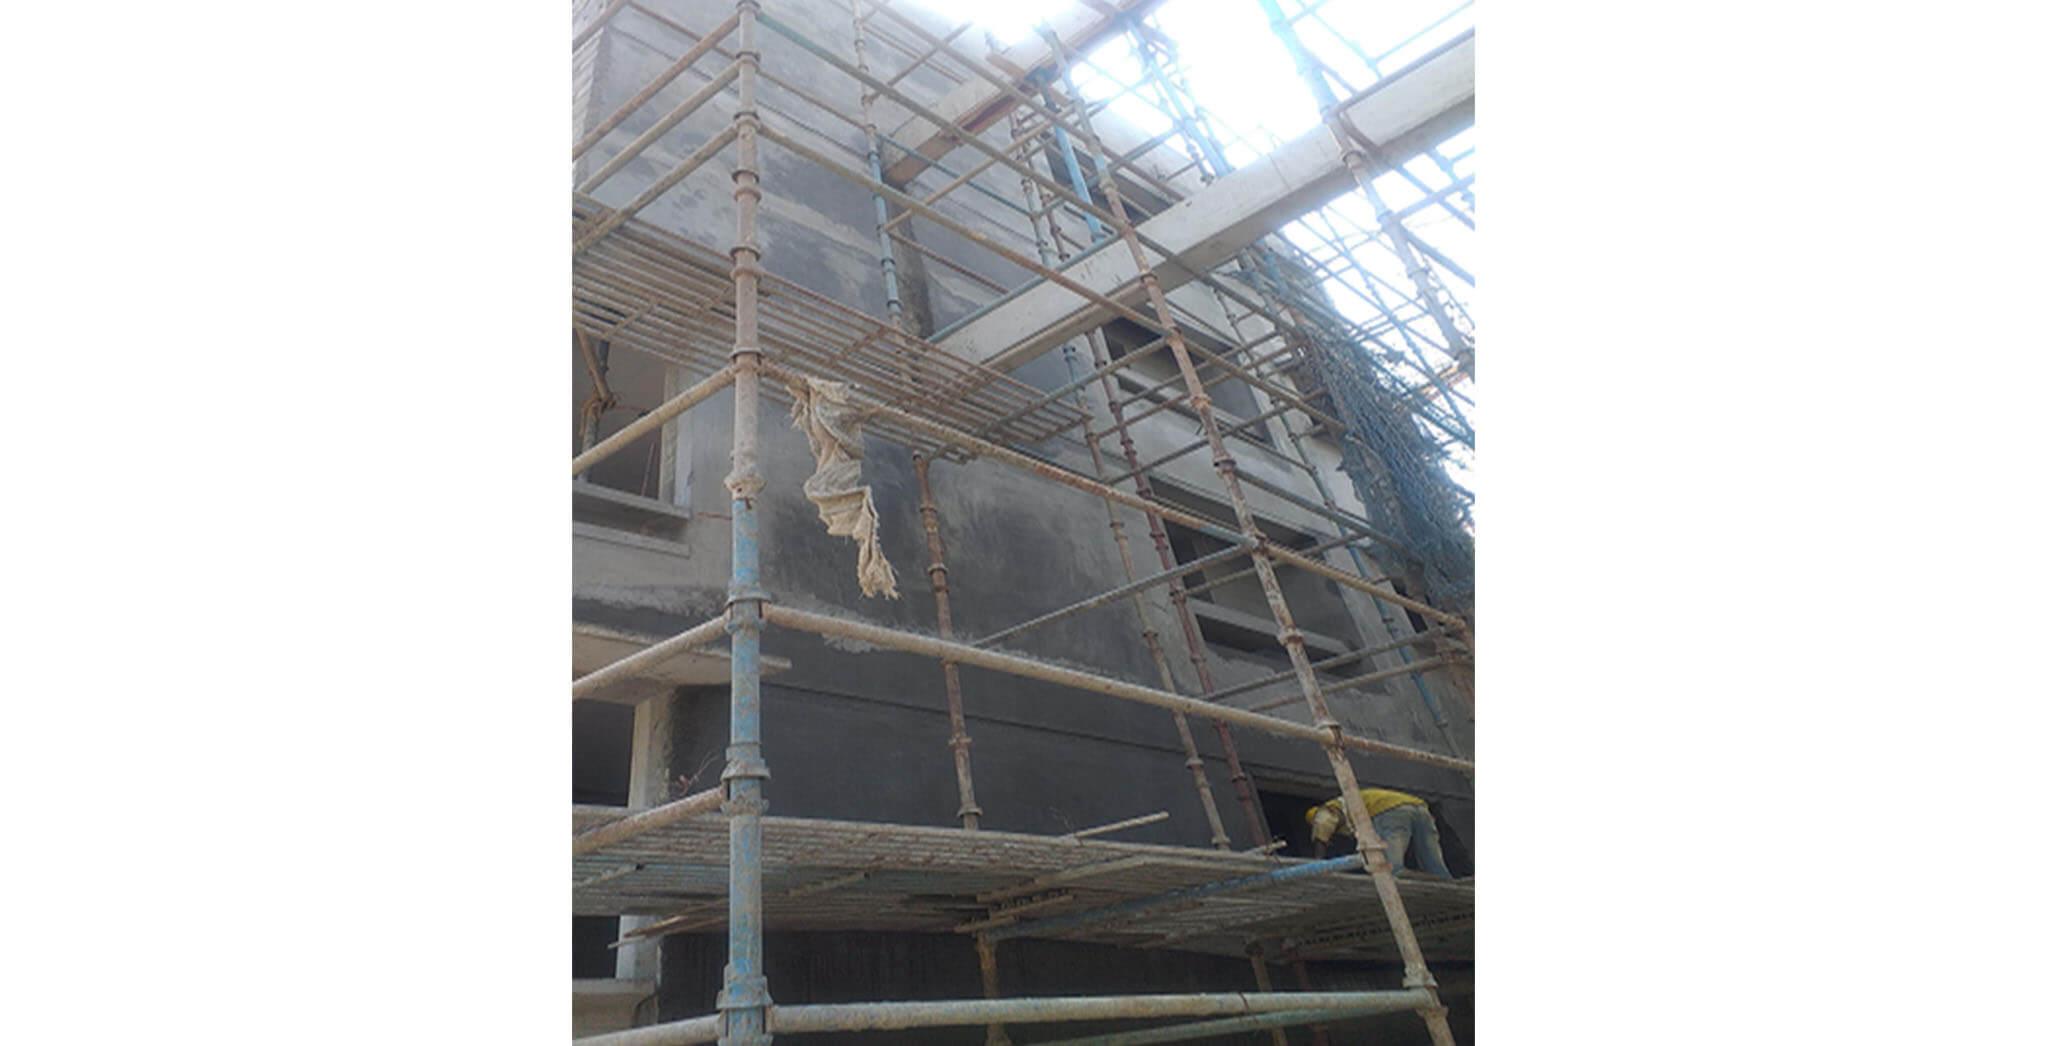 Feb 2021 - North side view: A Block—2 Series flat external plastering work-in-progress